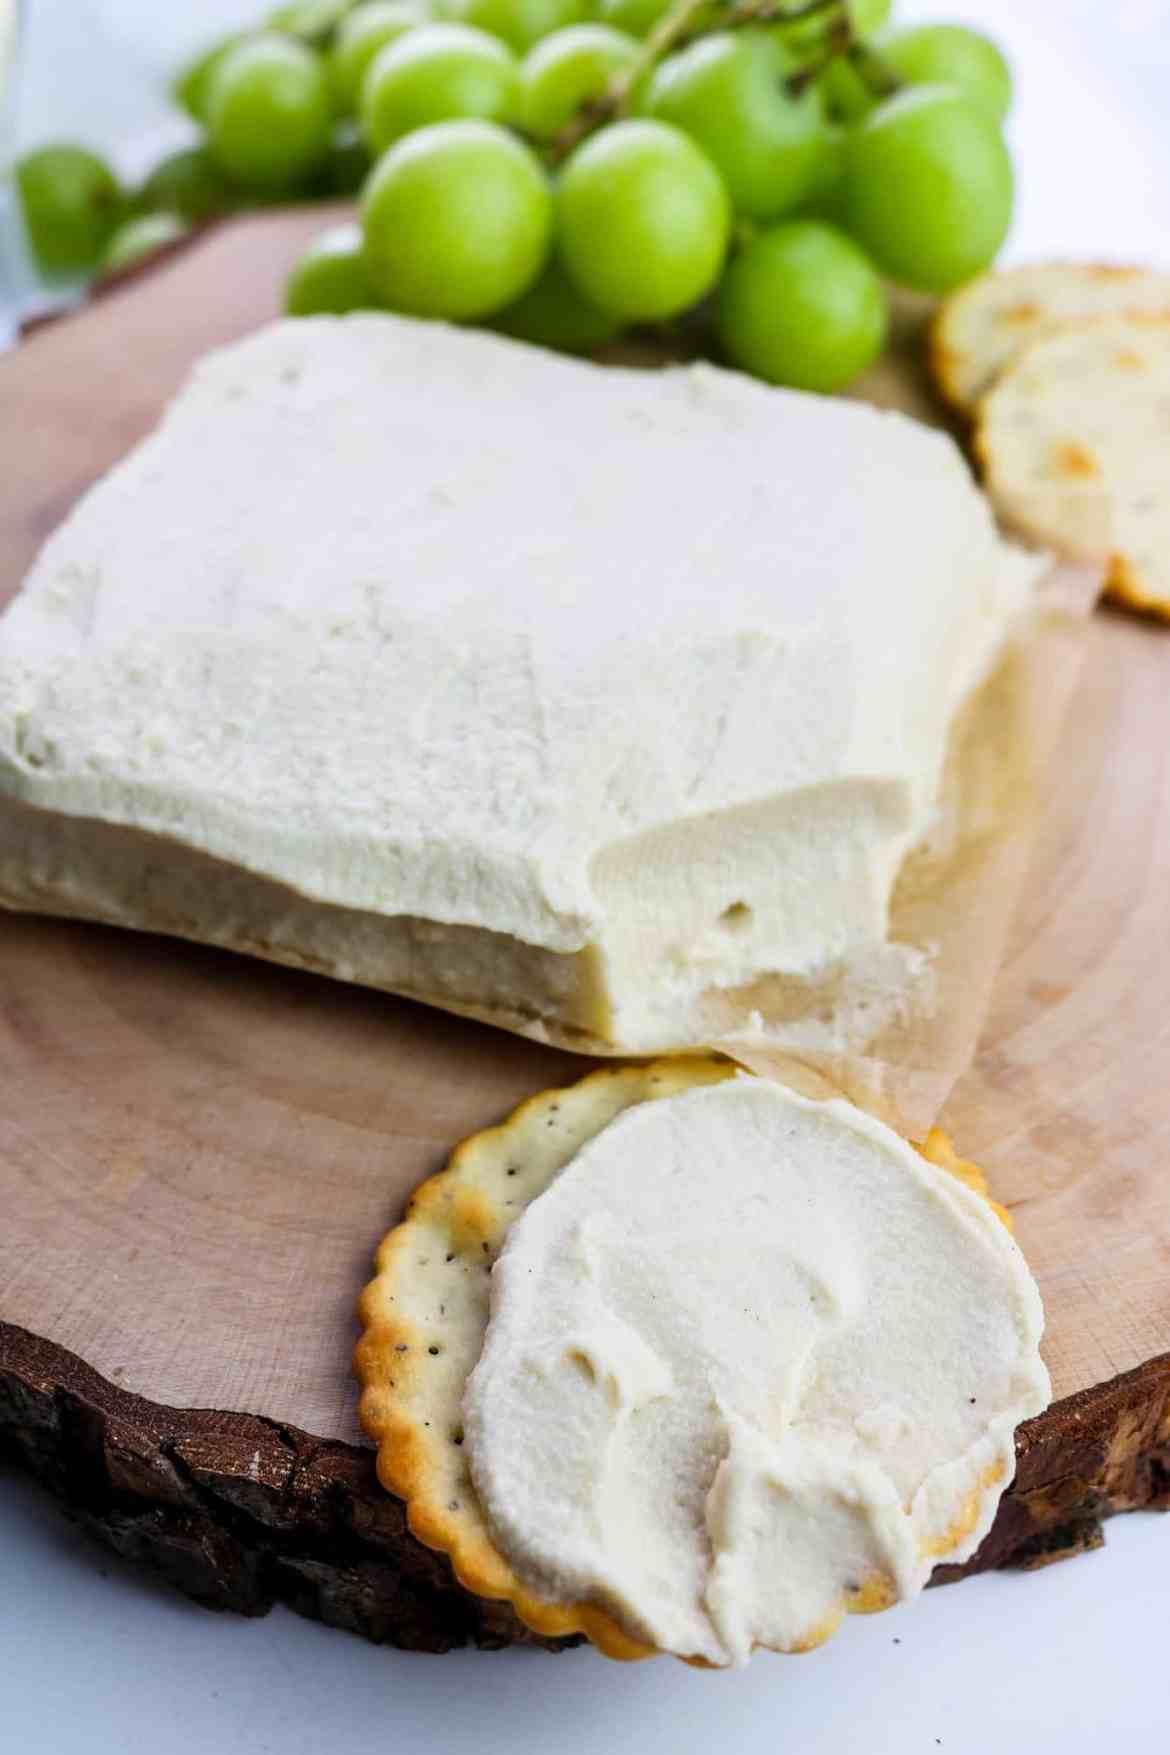 vegan overnight fermented cream cheese on cracker